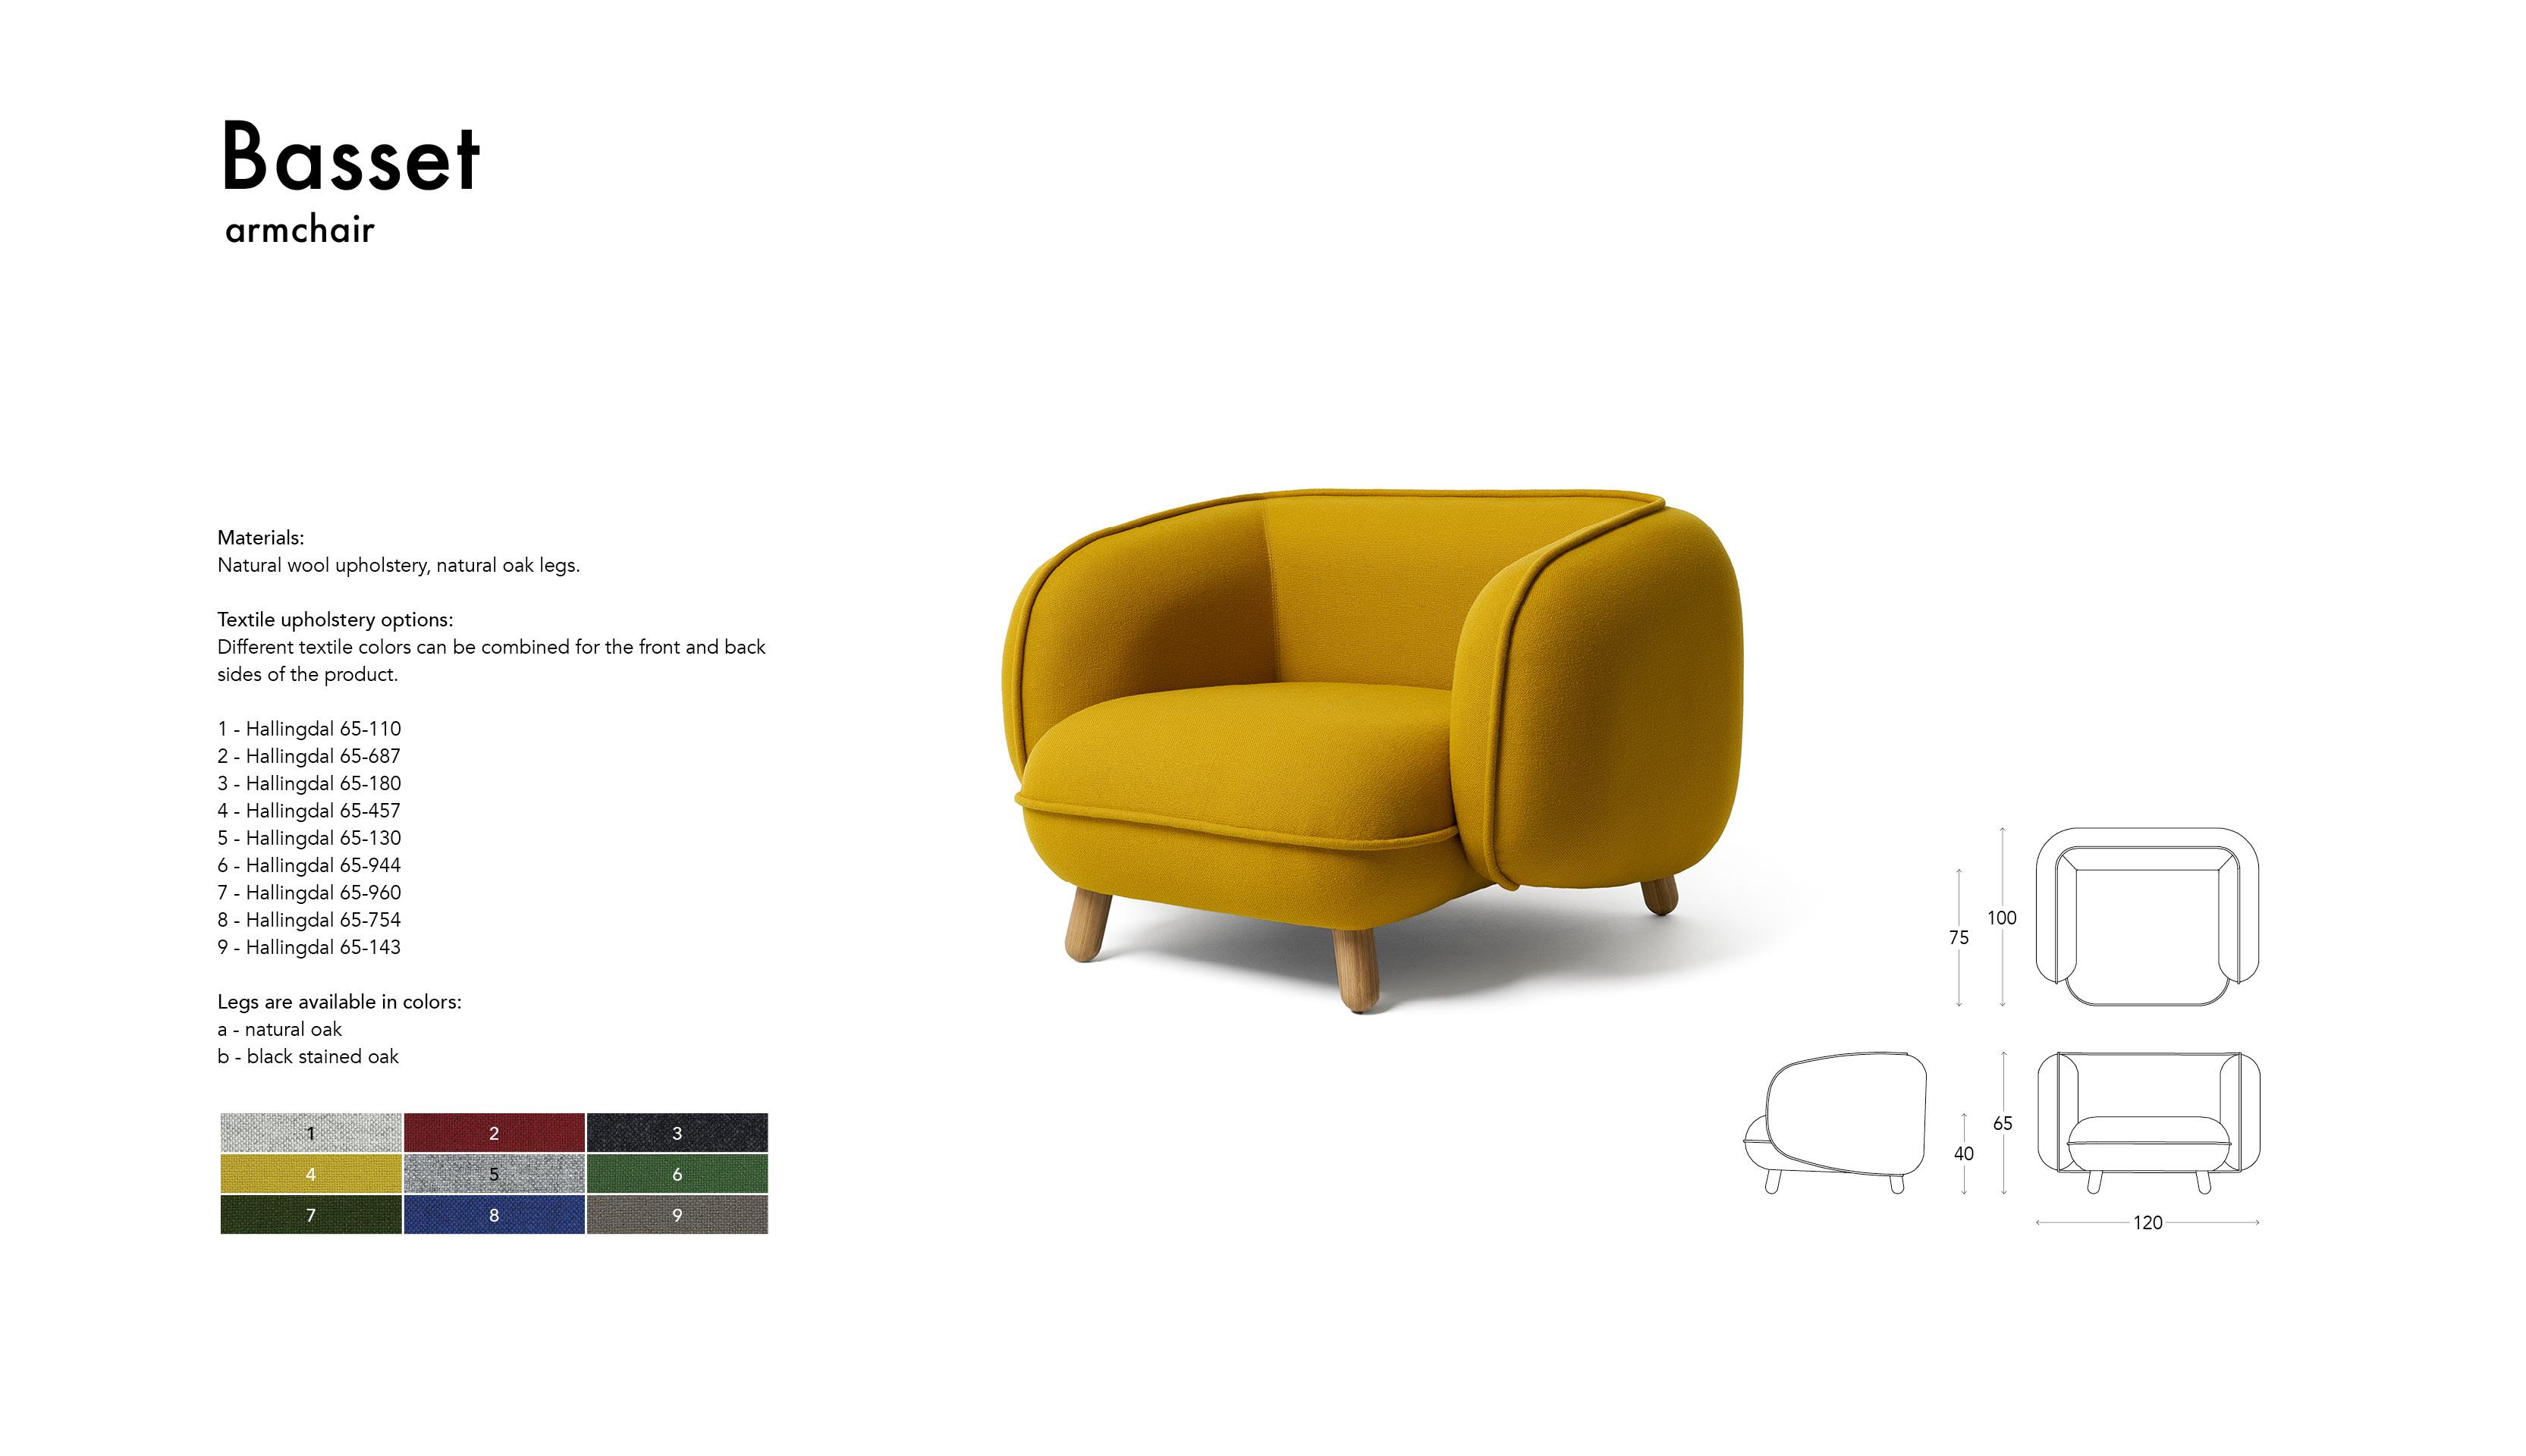 Basset arm chair